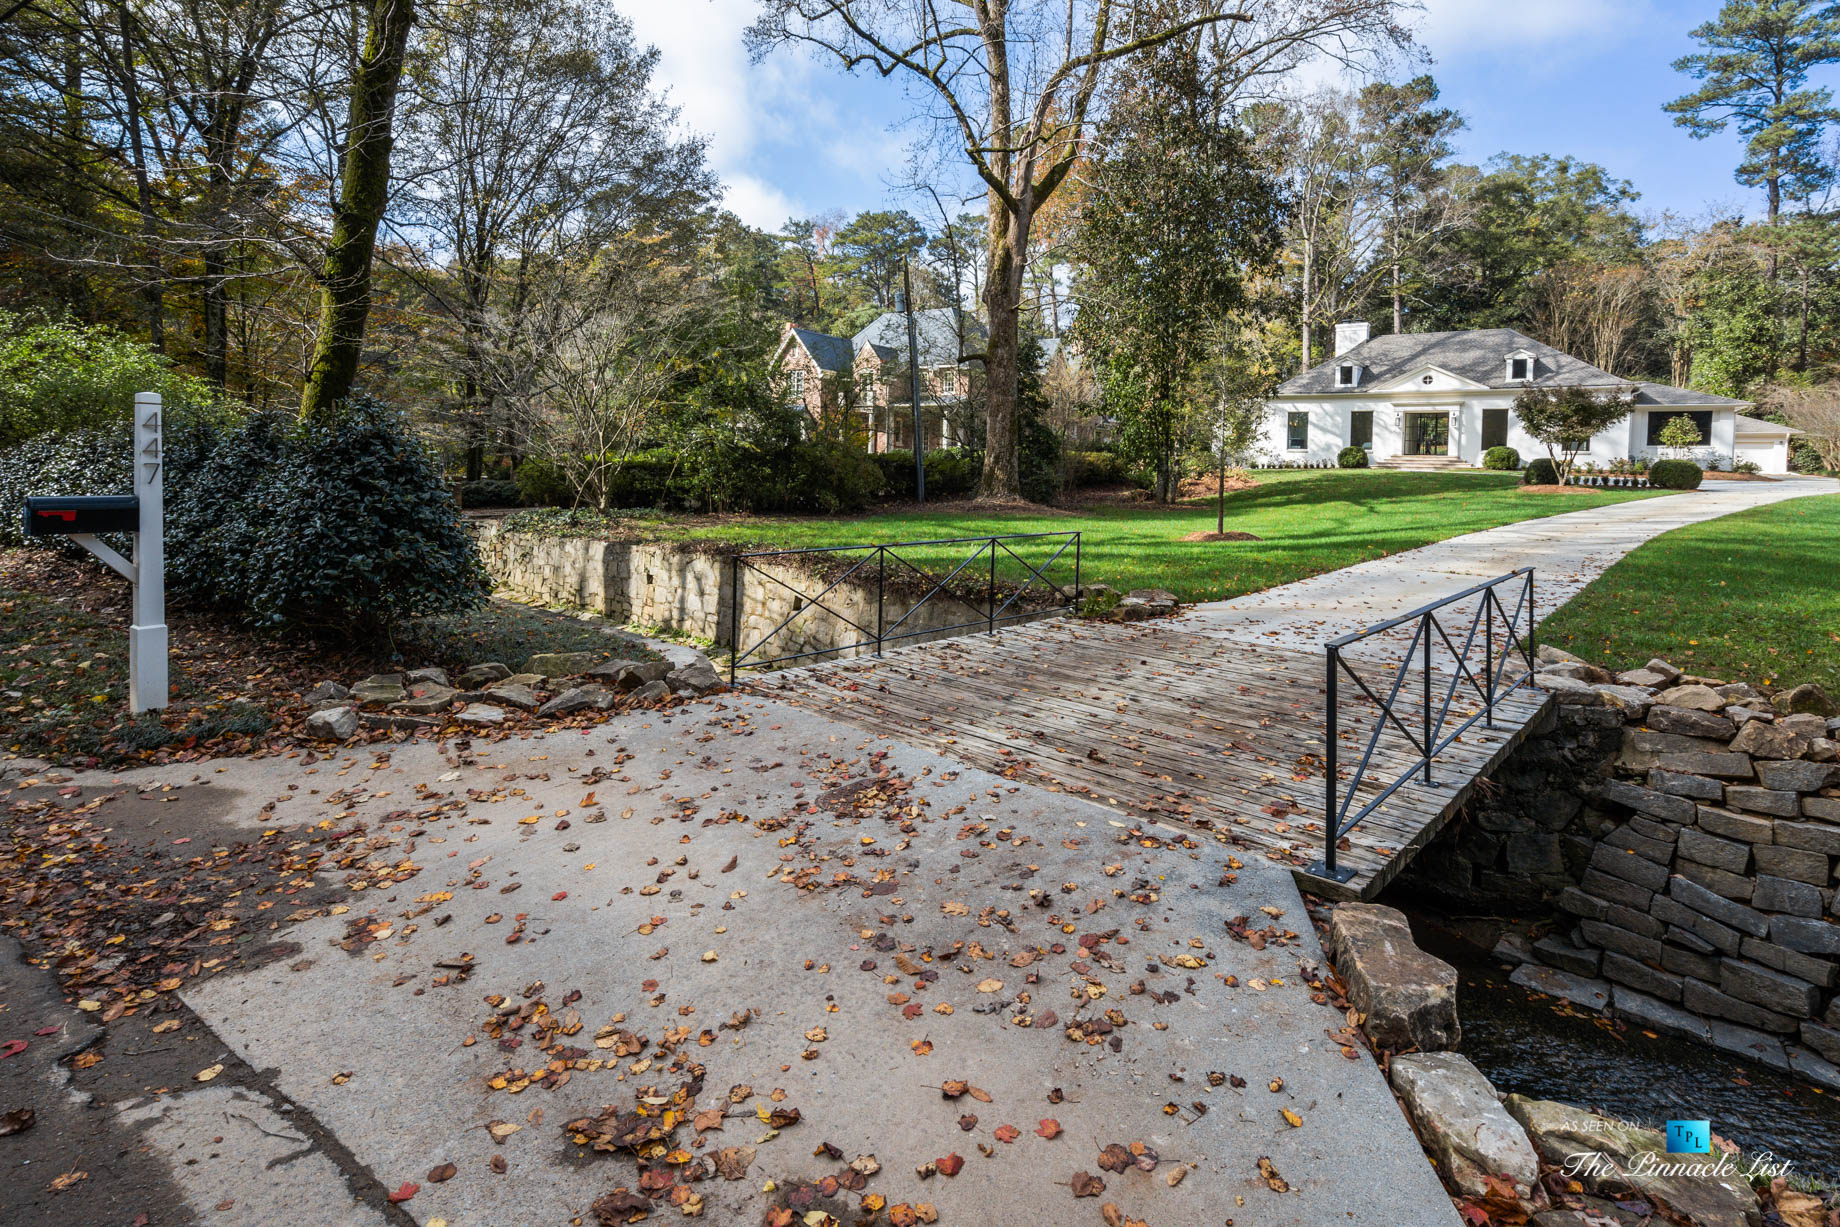 447 Valley Rd NW, Atlanta, GA, USA - Driveway - Luxury Real Estate - Tuxedo Park Home